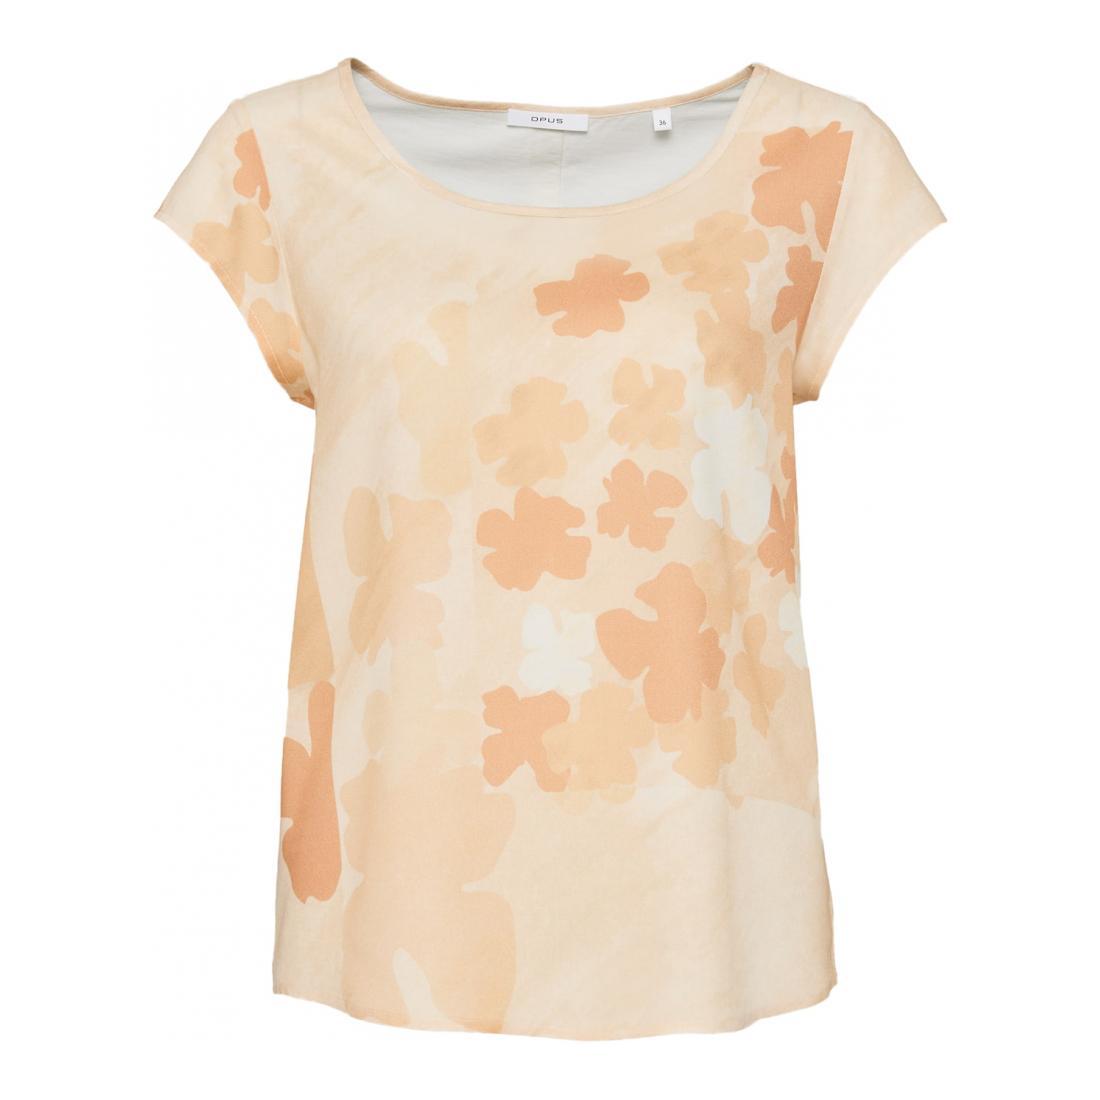 Opus T-Shirt Damen Flinka faded